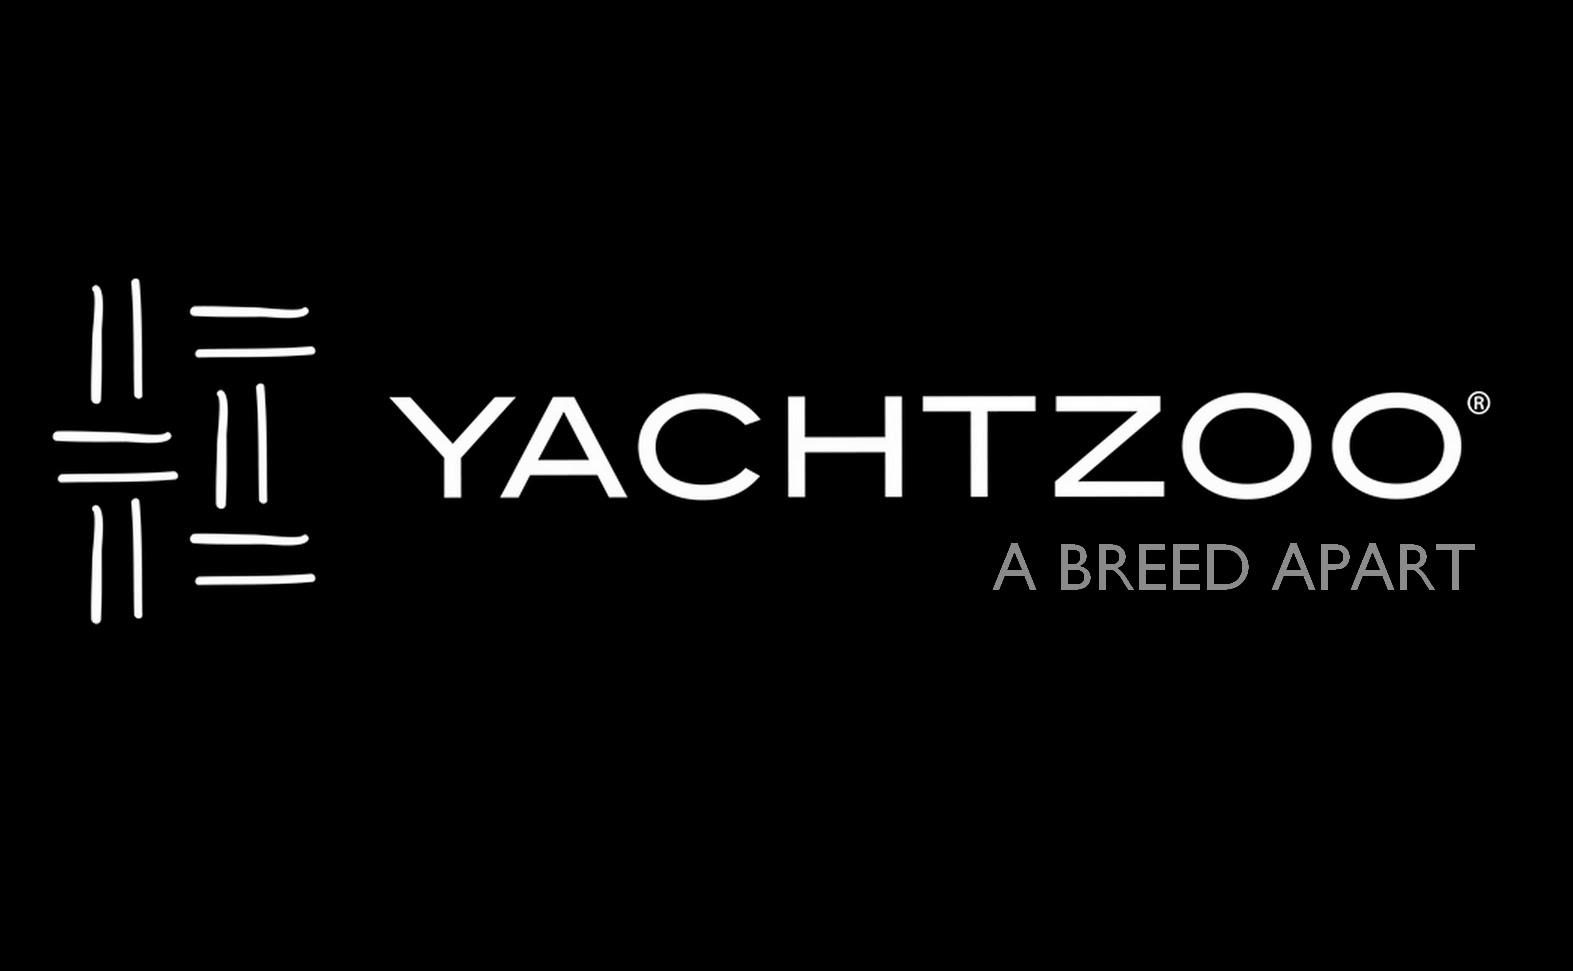 Yacht Zoo